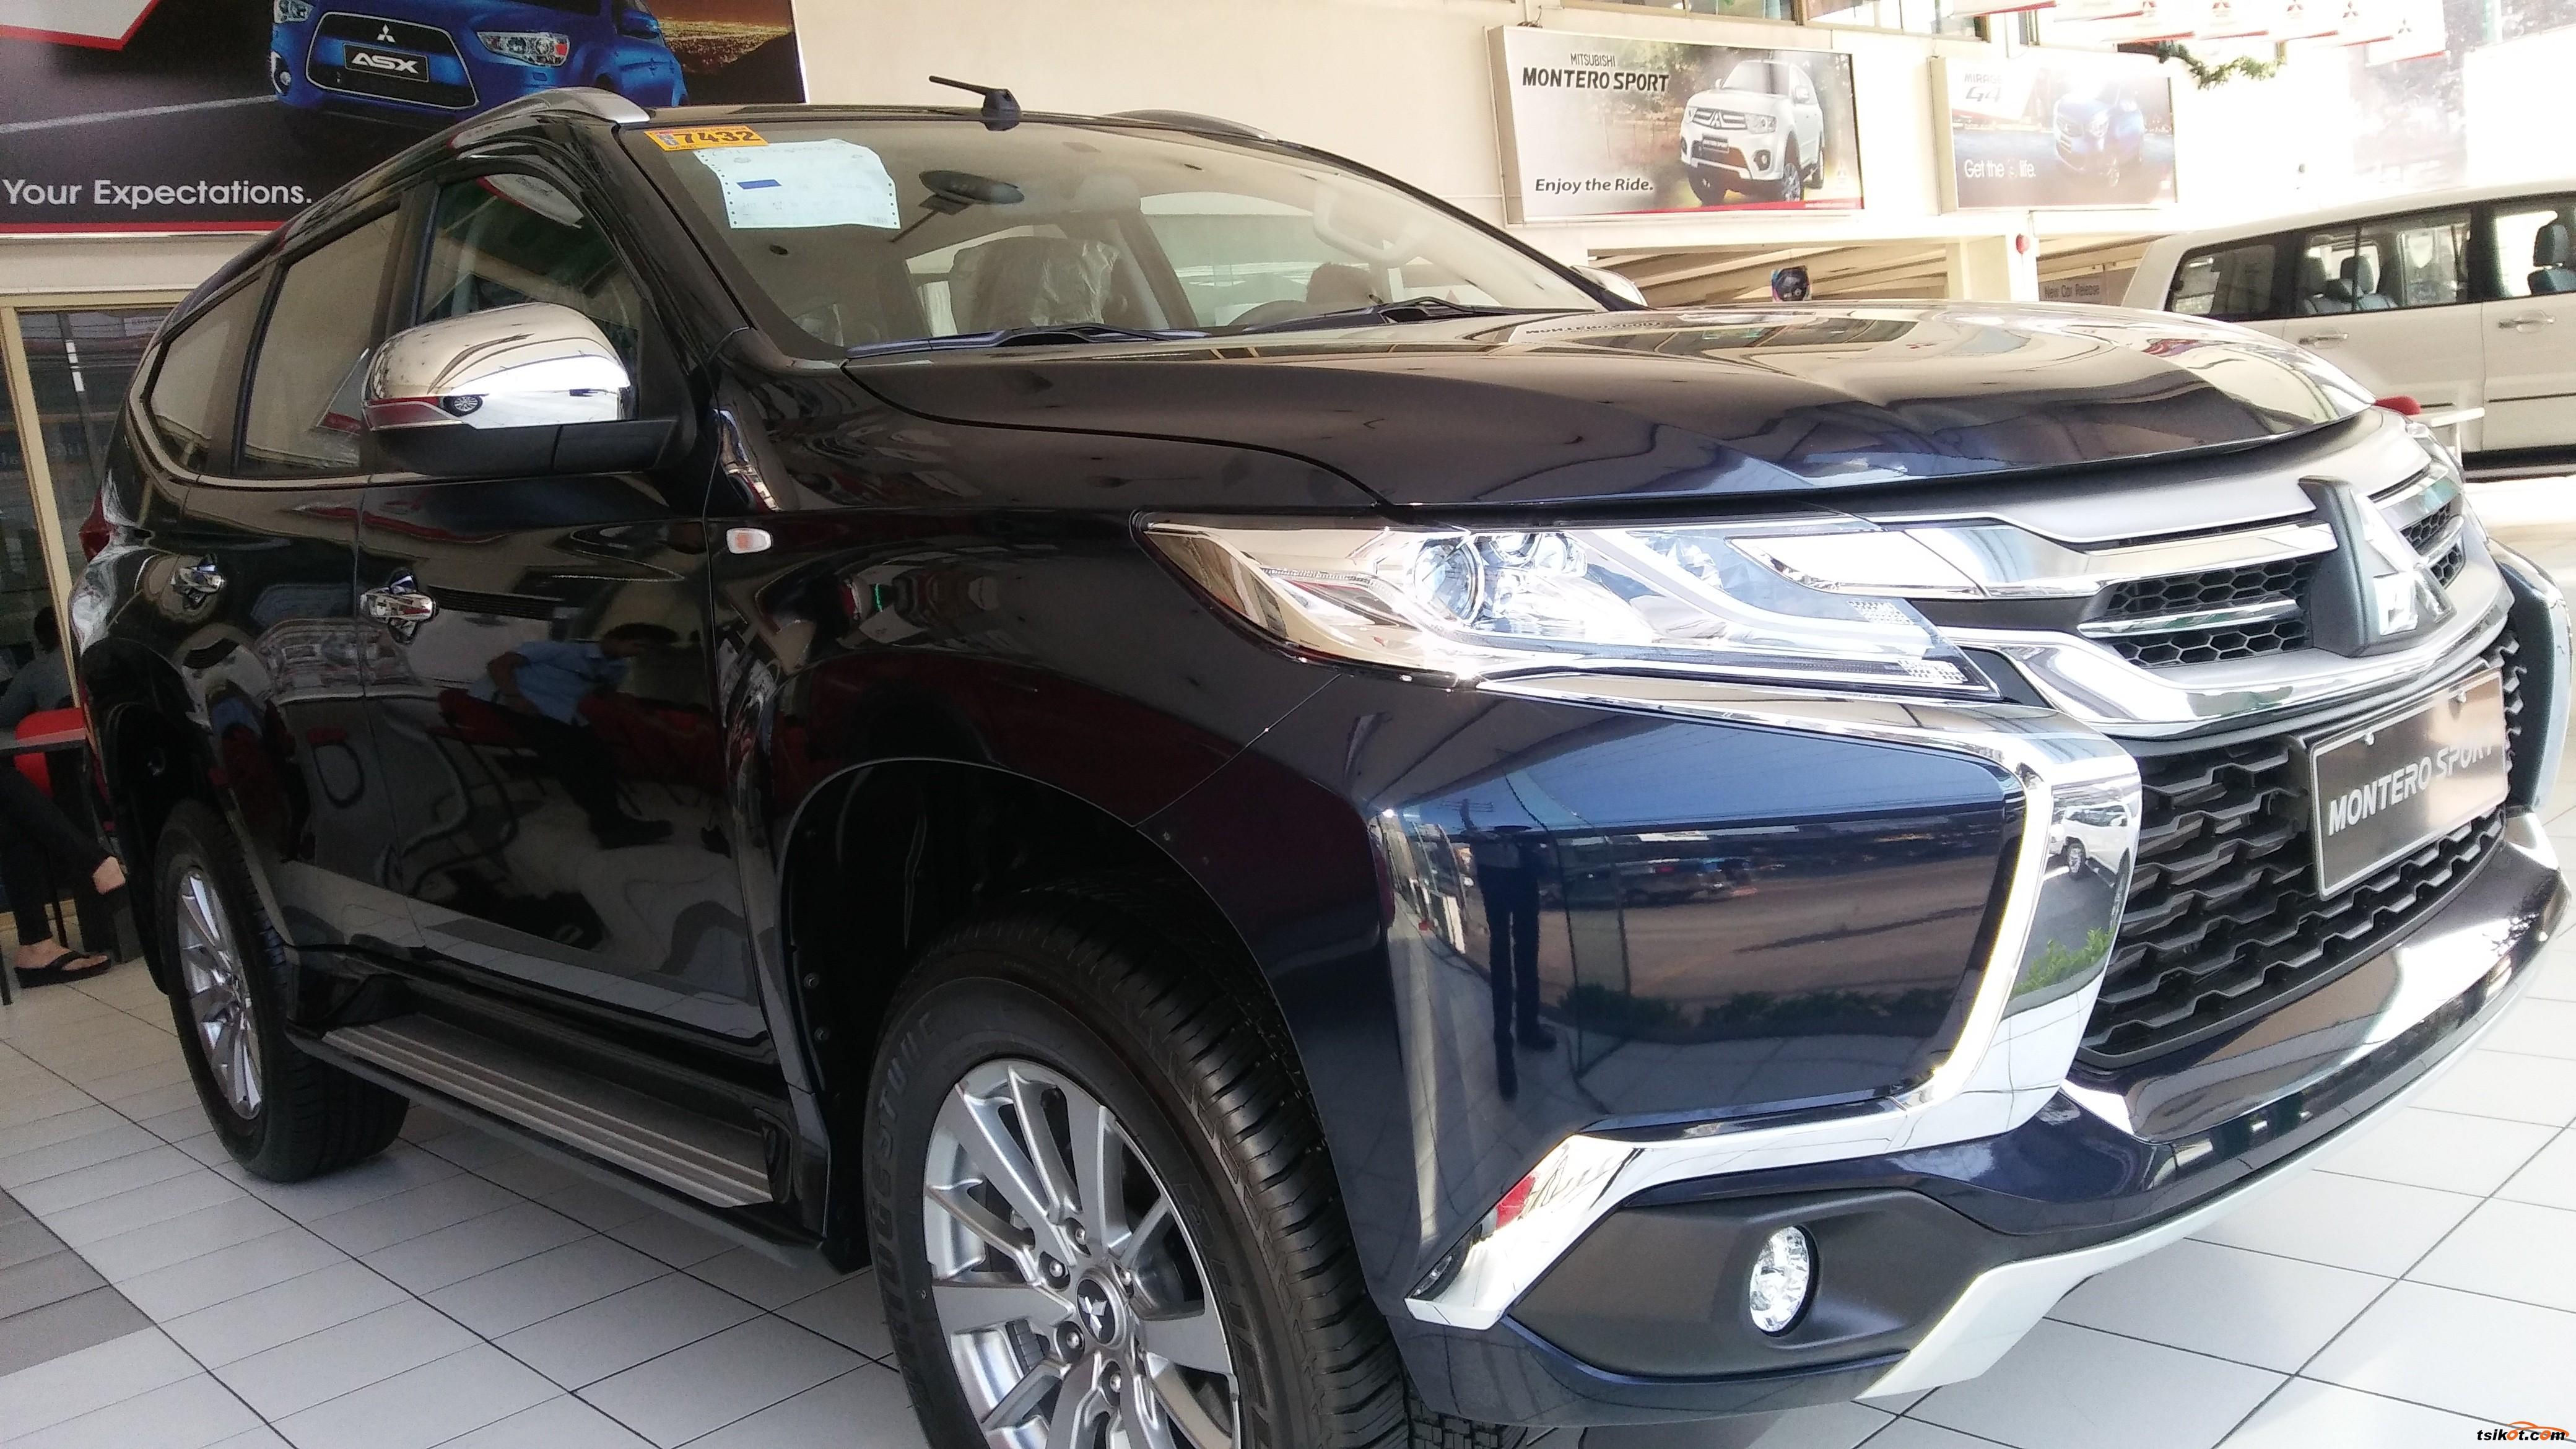 Mitsubishi Montero 2017 Car For Sale Metro Manila